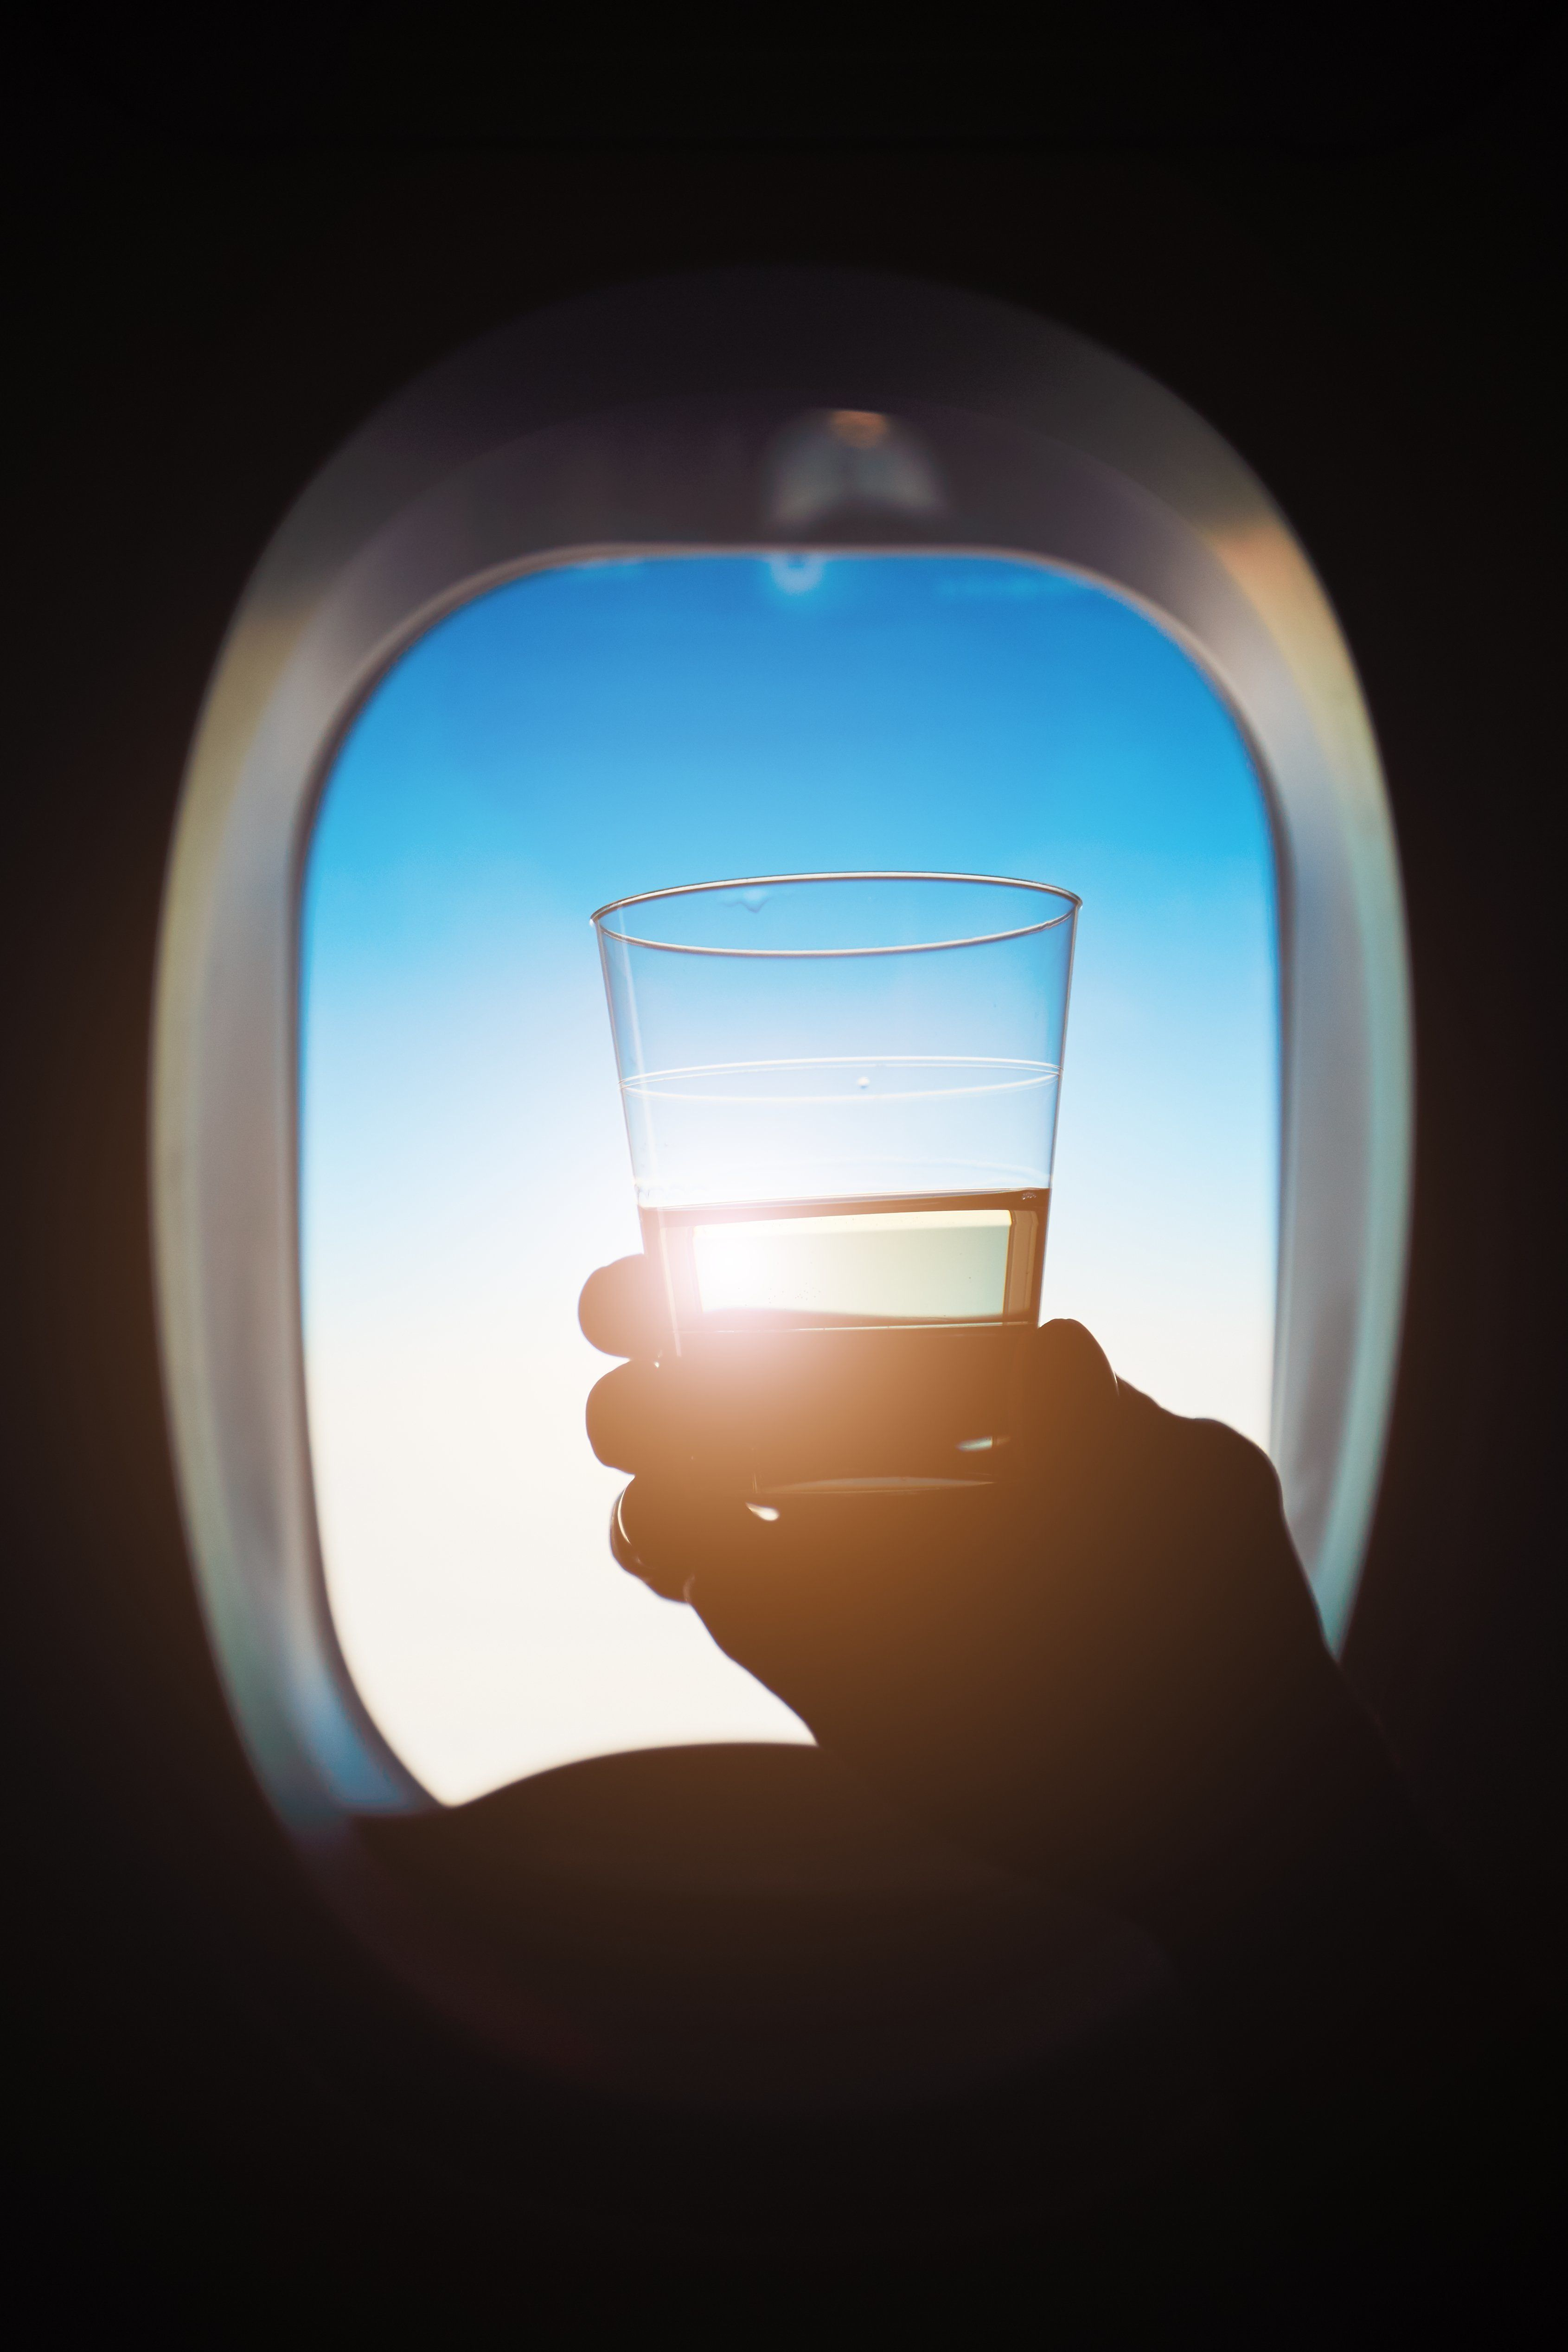 Dubai: Mutter soll wegen Glas Wein Haft drohen – nun widersprechen